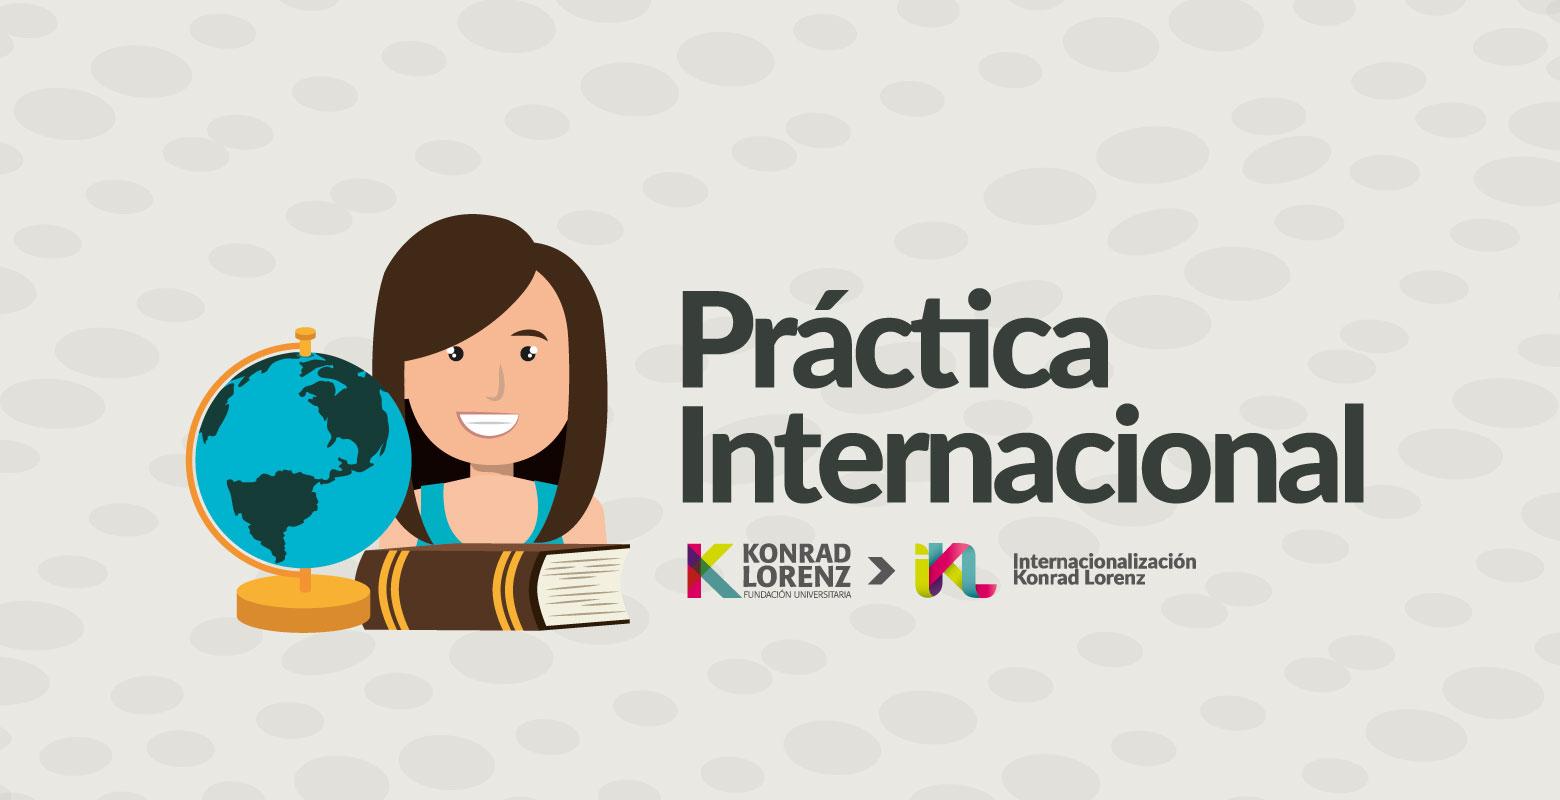 Práctica Internacional